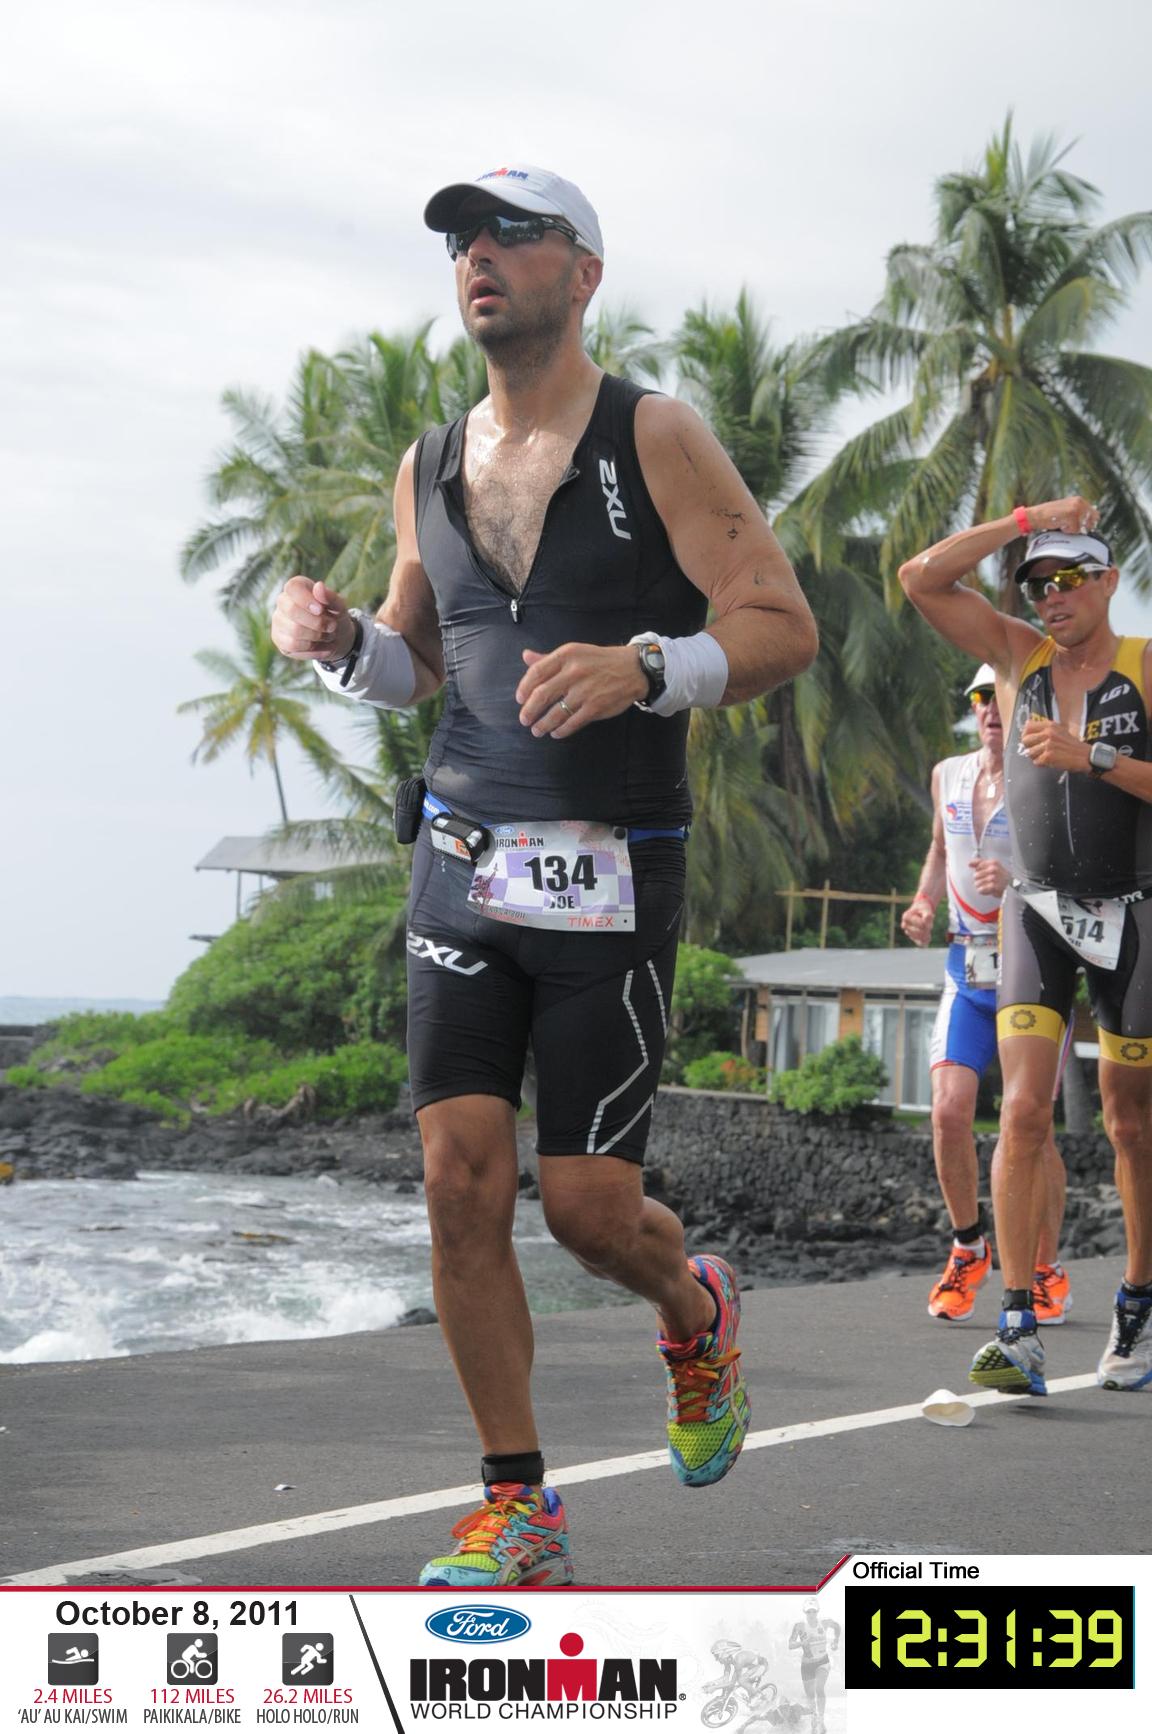 Joe nell'ironman di Kona, 2011 - Running Post